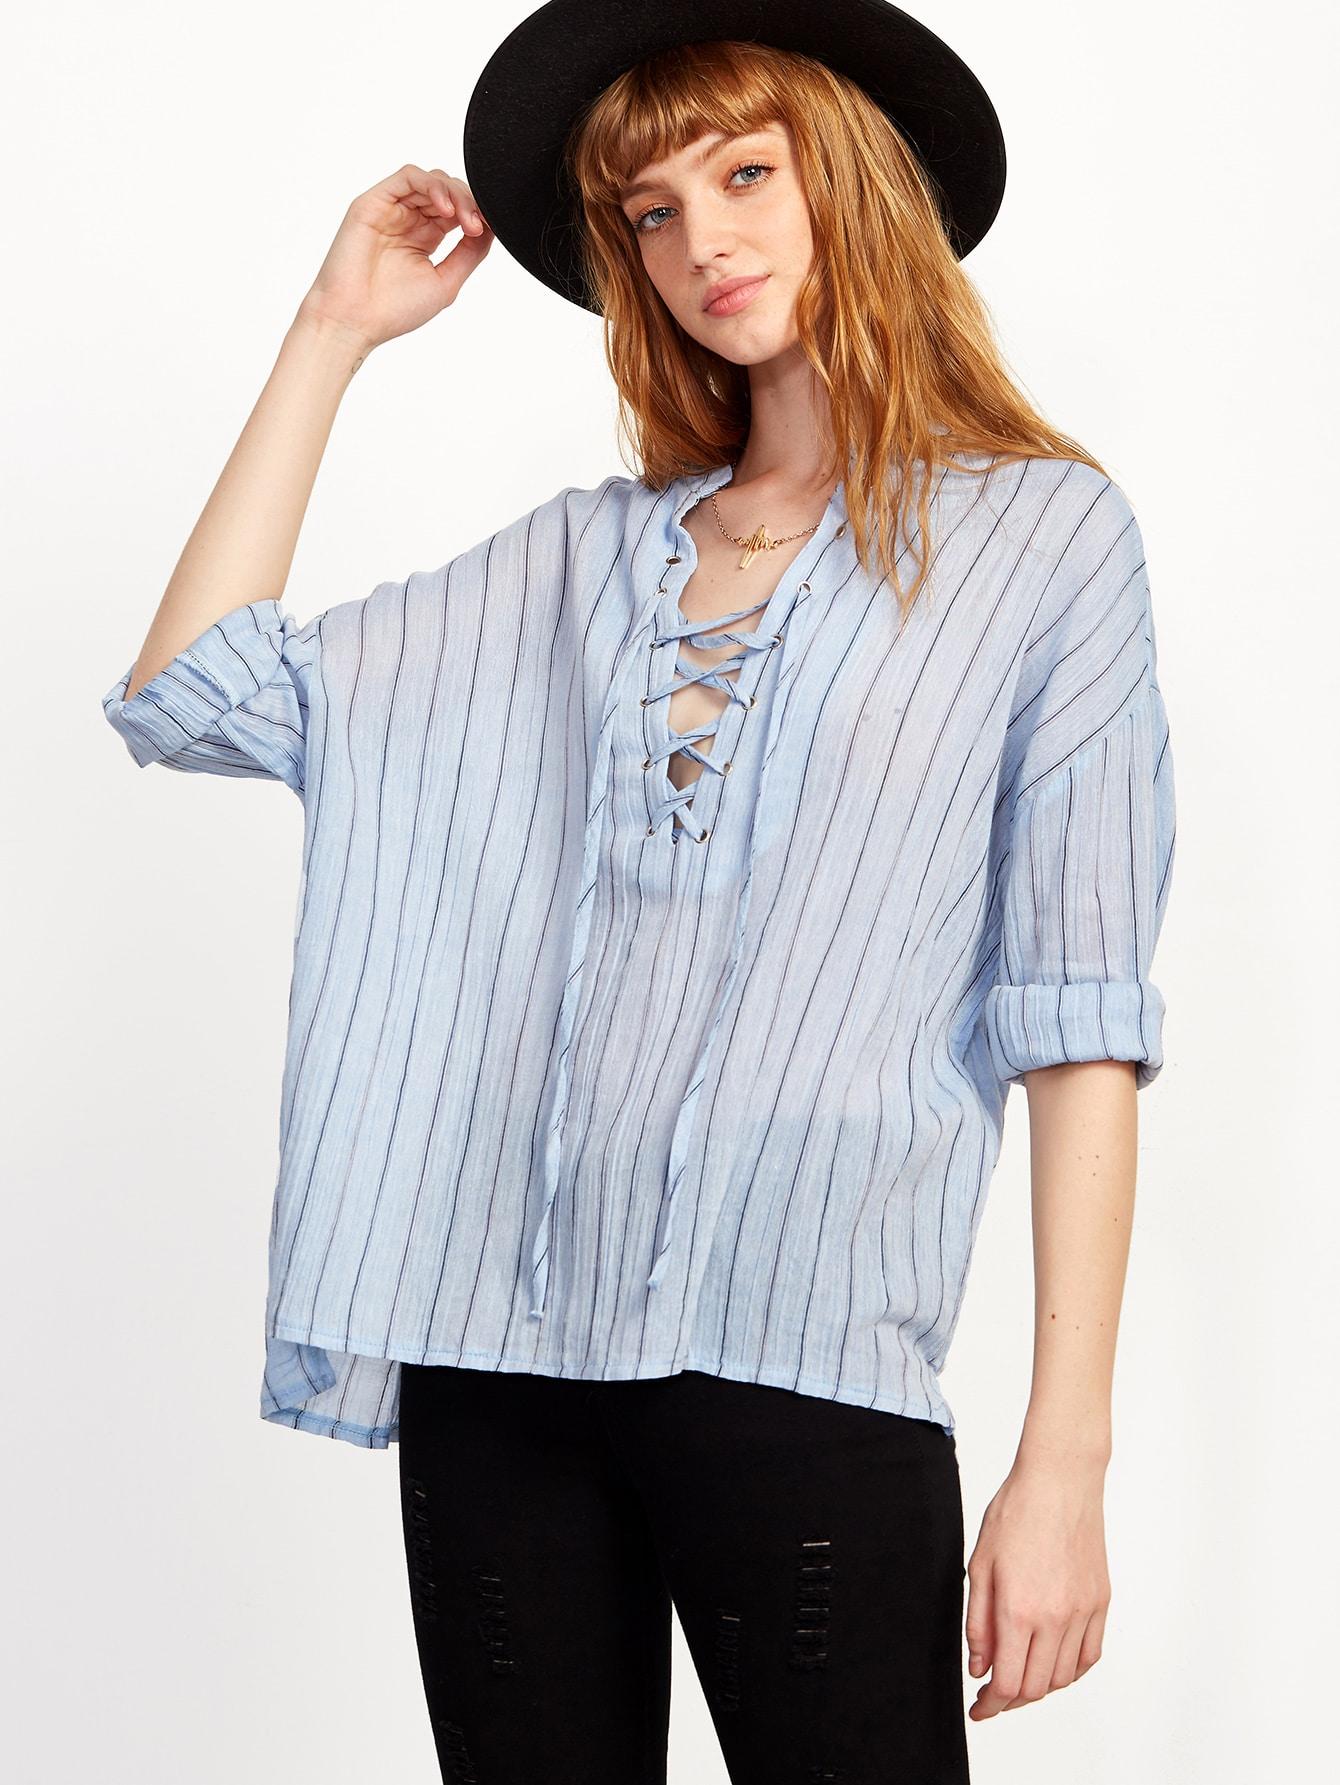 V Cut Lace Up Vertical Striped Blouse blouse160914403